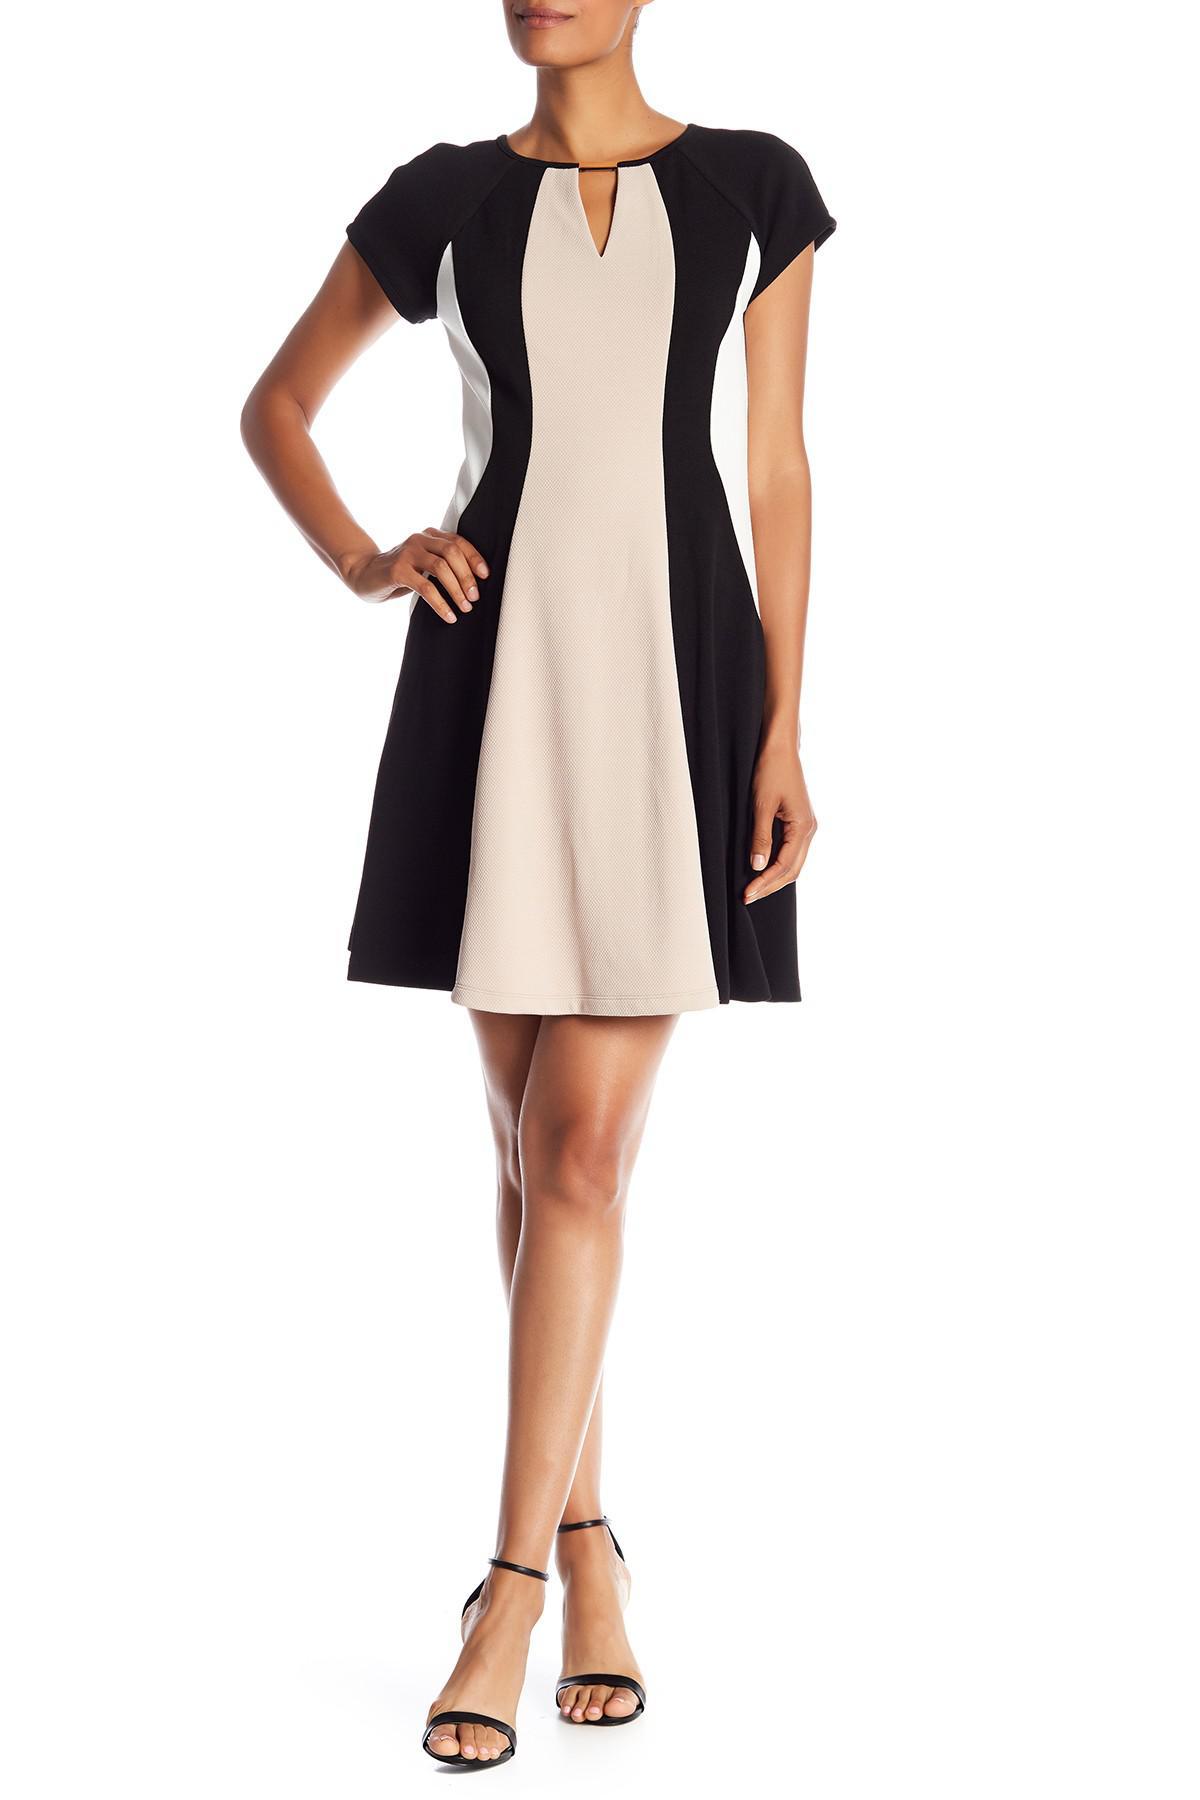 35c06bc7b53f1 Lyst - Sandra Darren Short Sleeve Colorblock Dress in Black